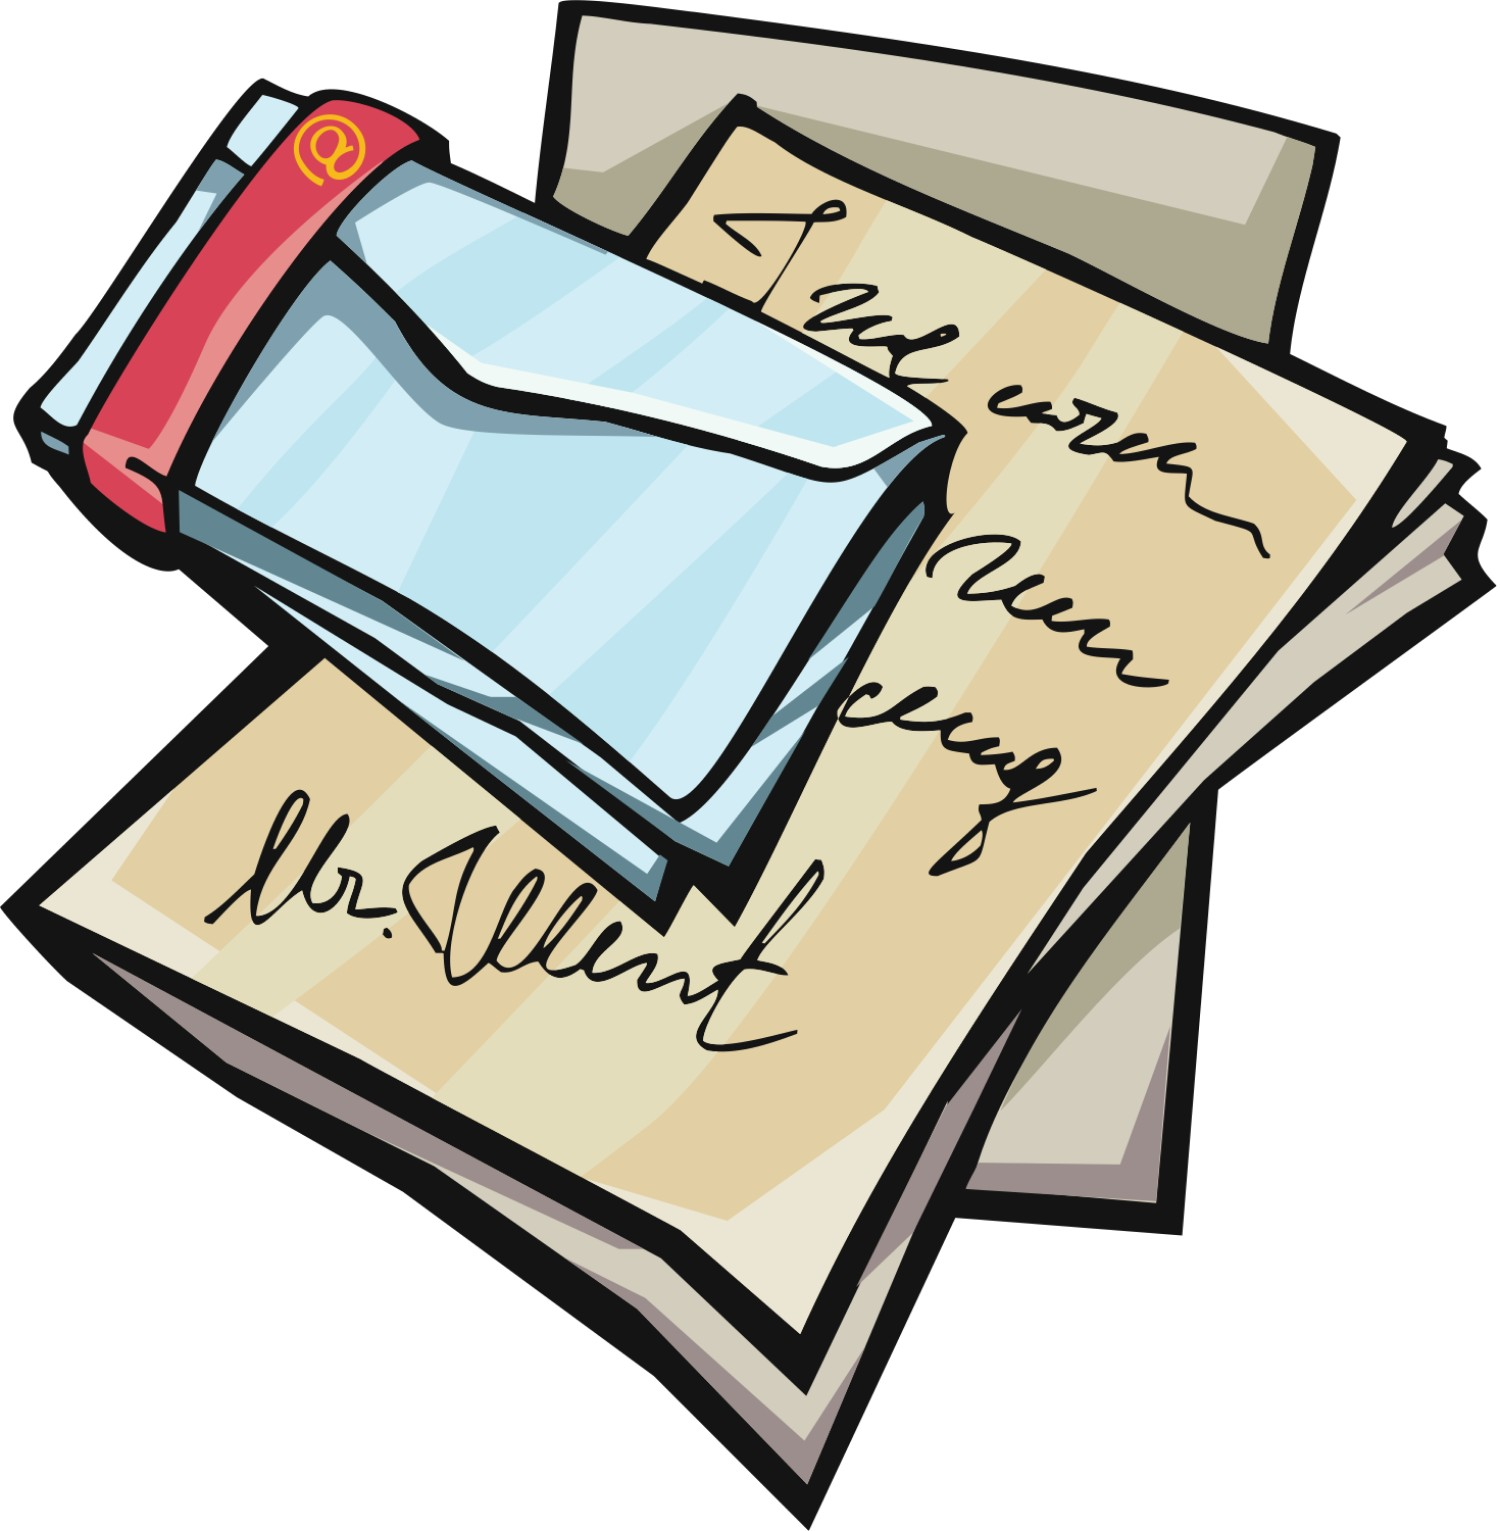 transparent Free i cliparts download. Letter clipart